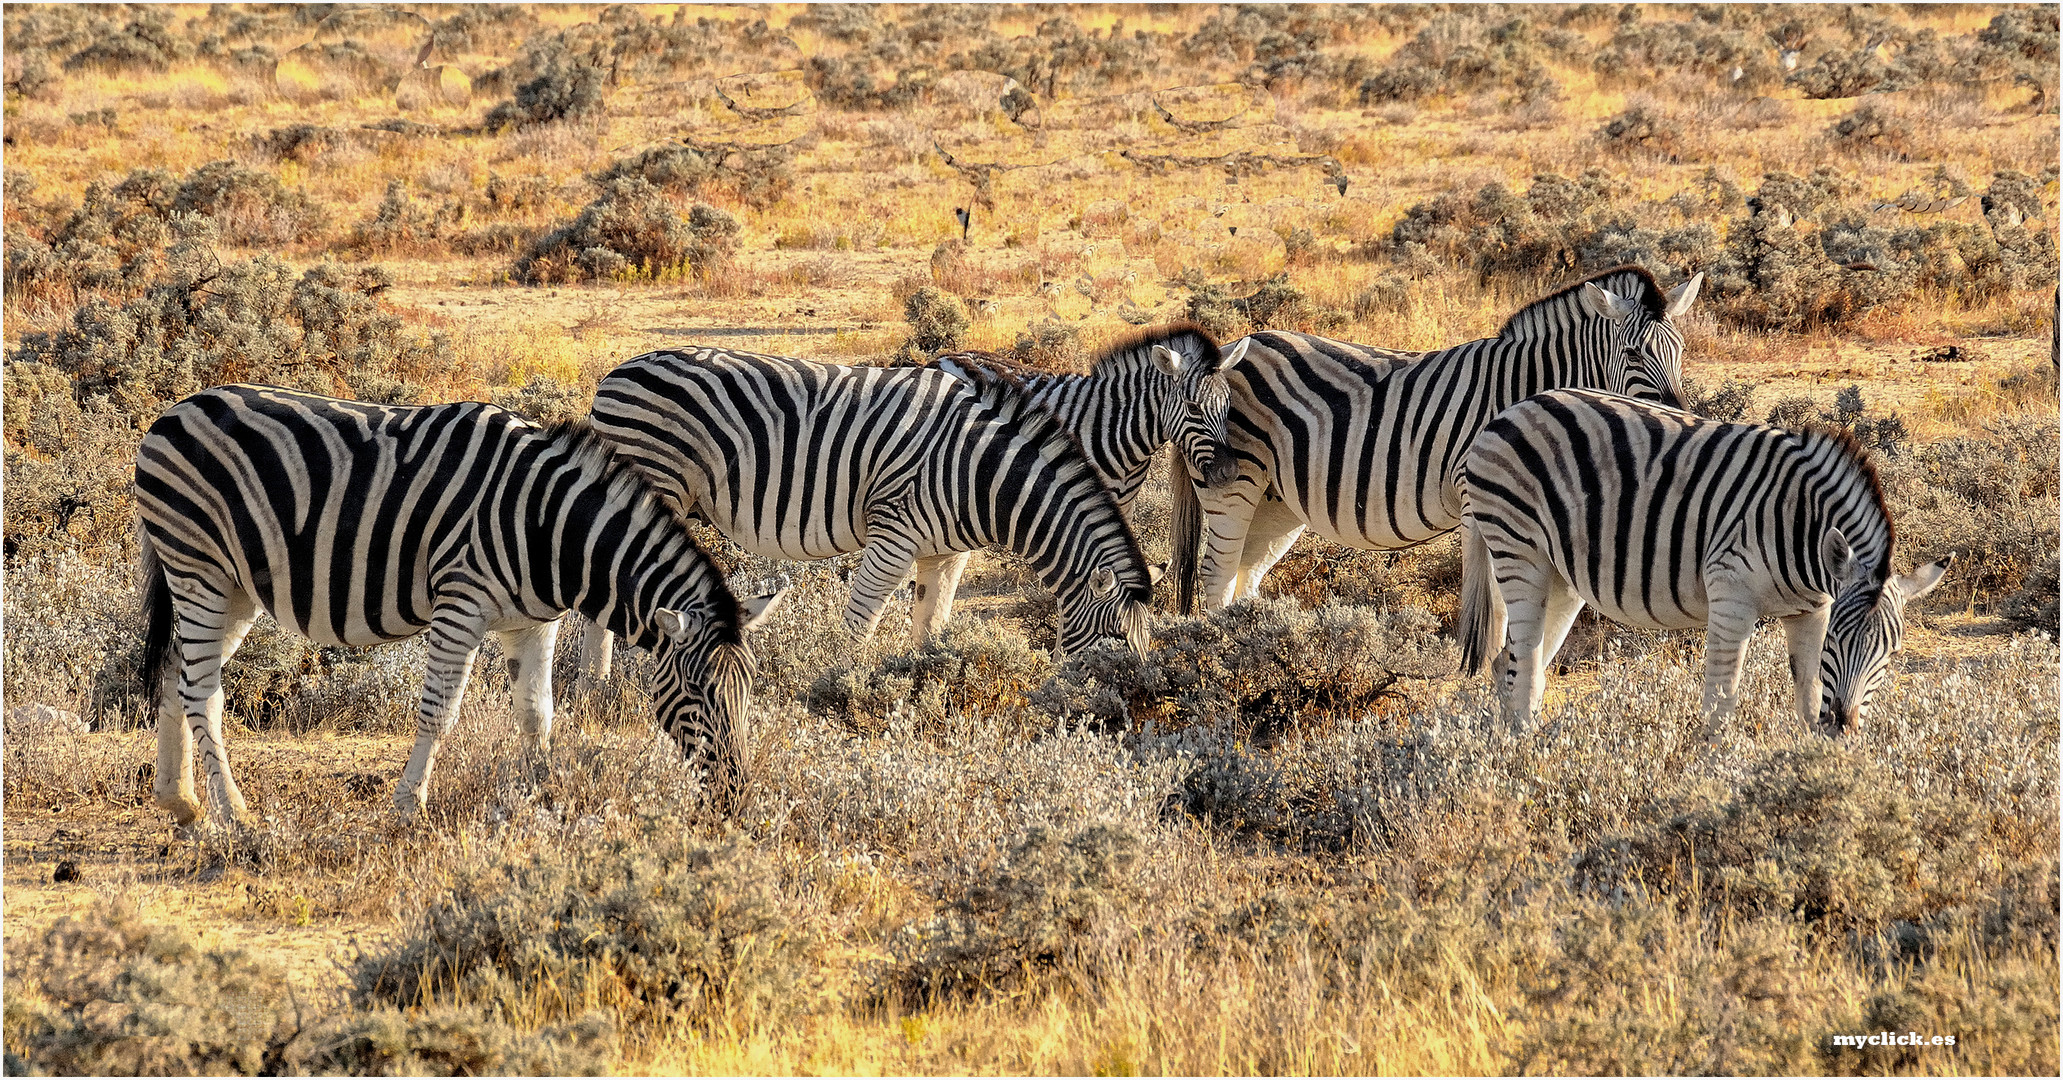 MEMORIAS DE AFRICA -CEBRAS -PN DE ETHOSA-NAMIBIA